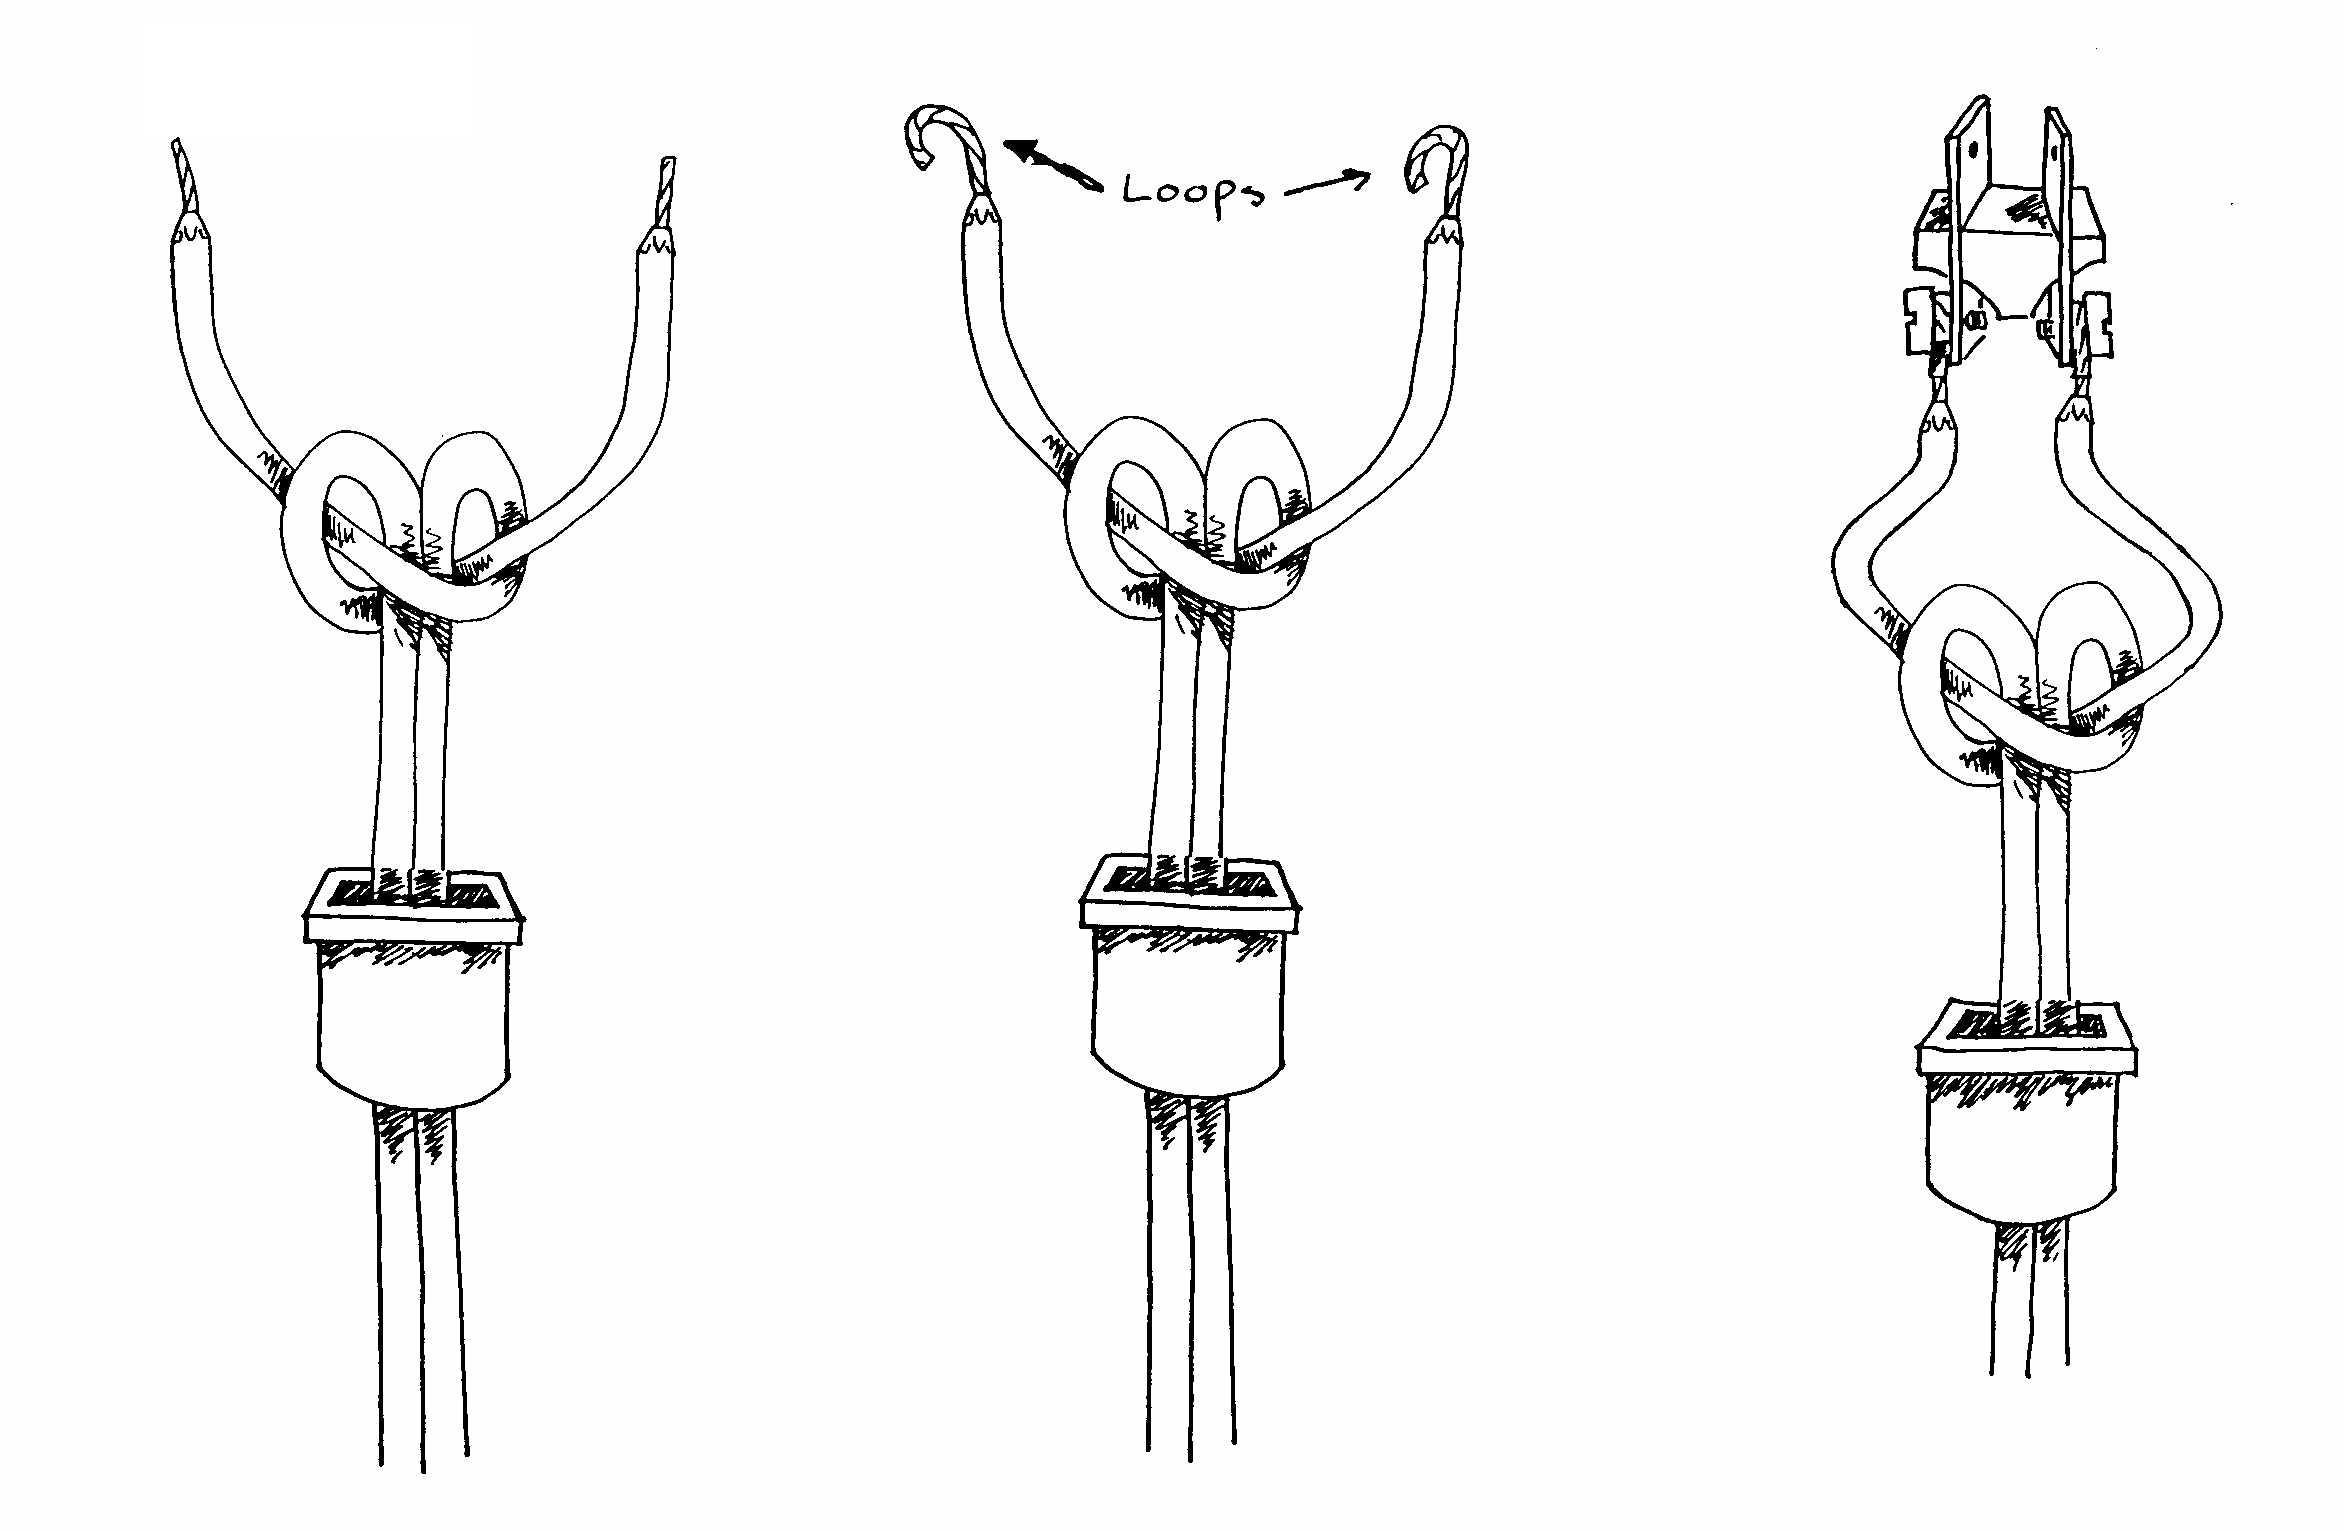 Wiring A Lamp Plug